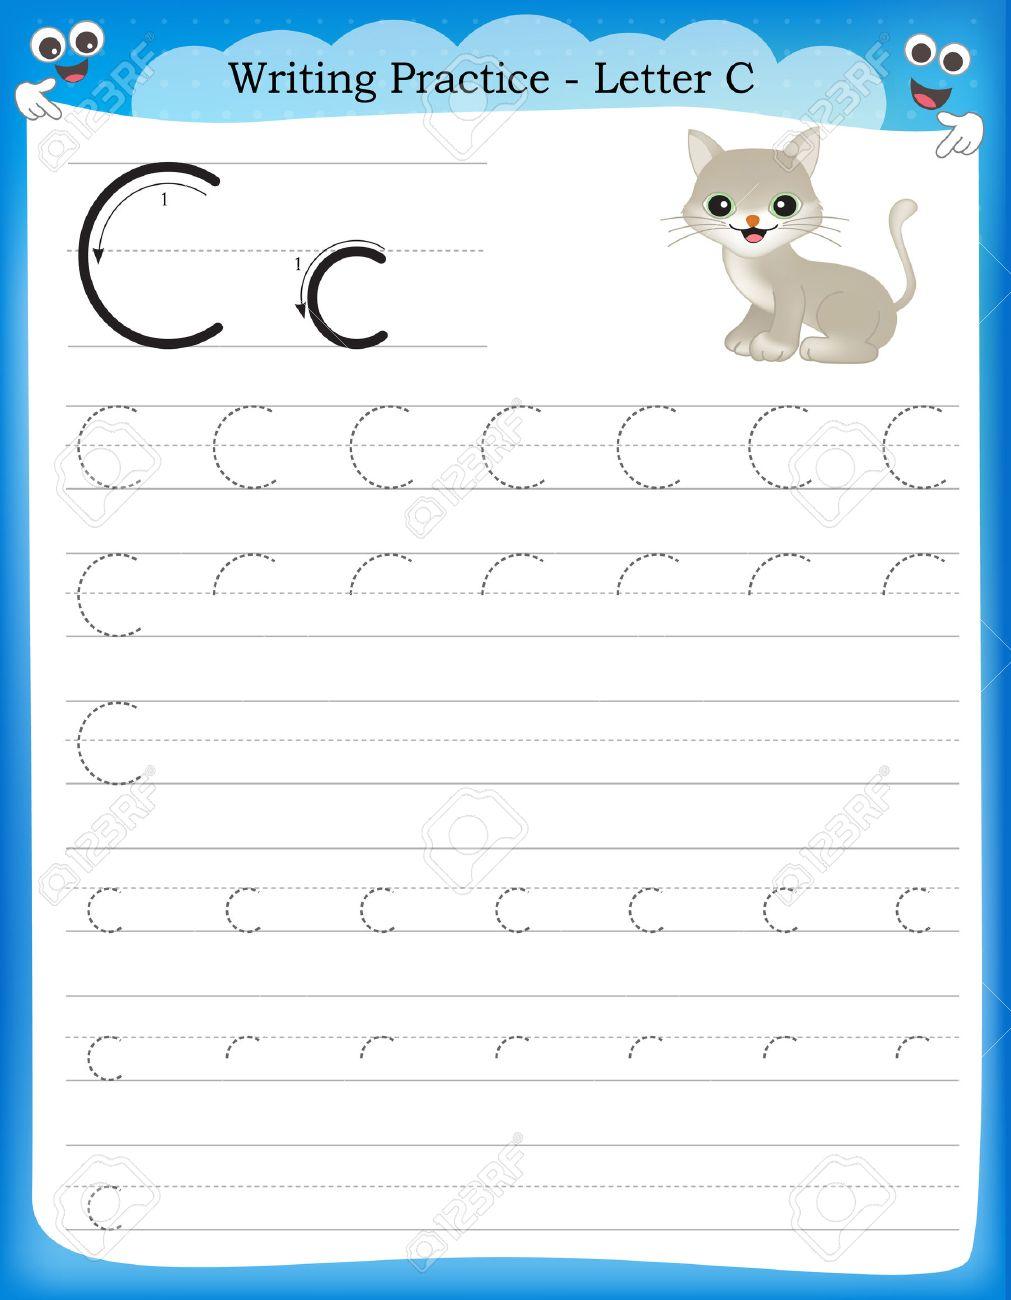 worksheet Writing Skills Worksheet writing practice letter c printable worksheet for preschool vector kindergarten kids to improve basic skills